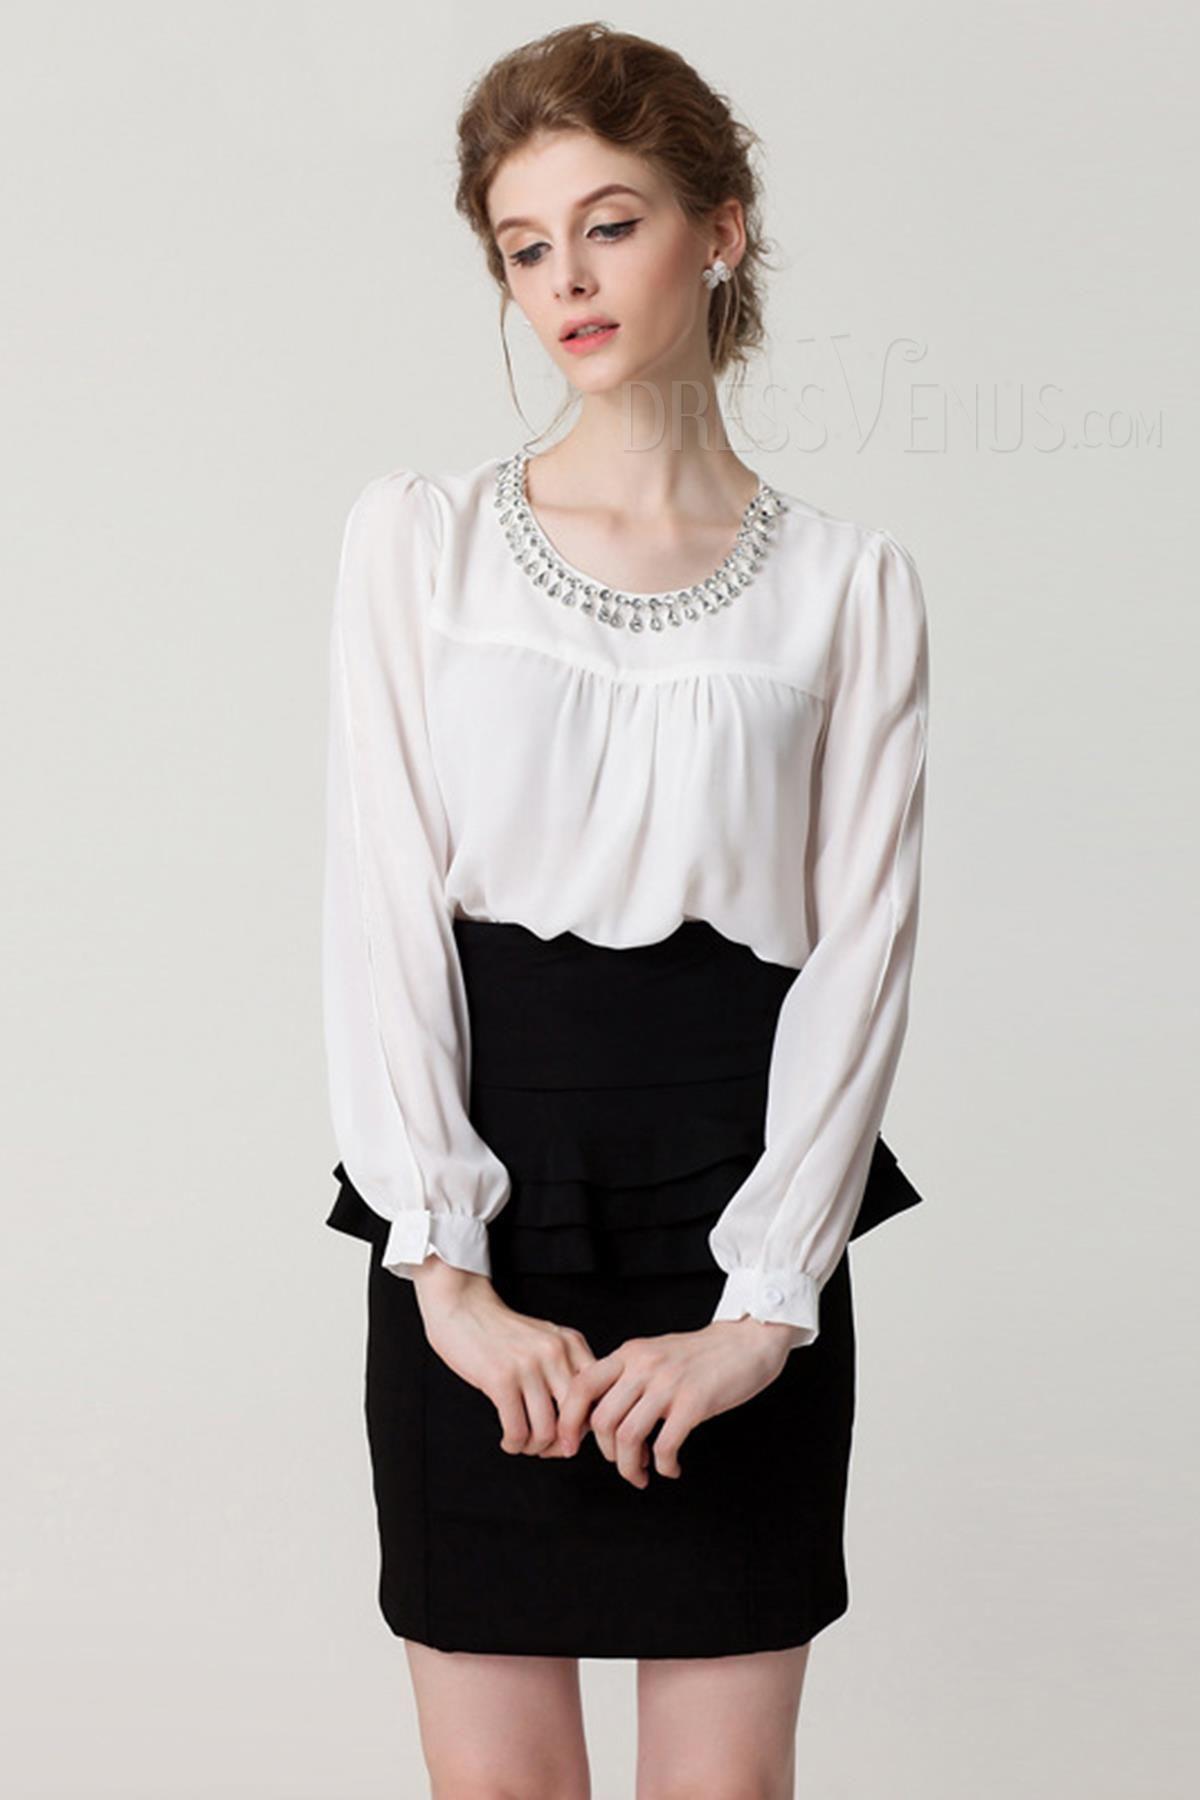 Allmatch rhinestone roundneck long sleeve chiffon blouse